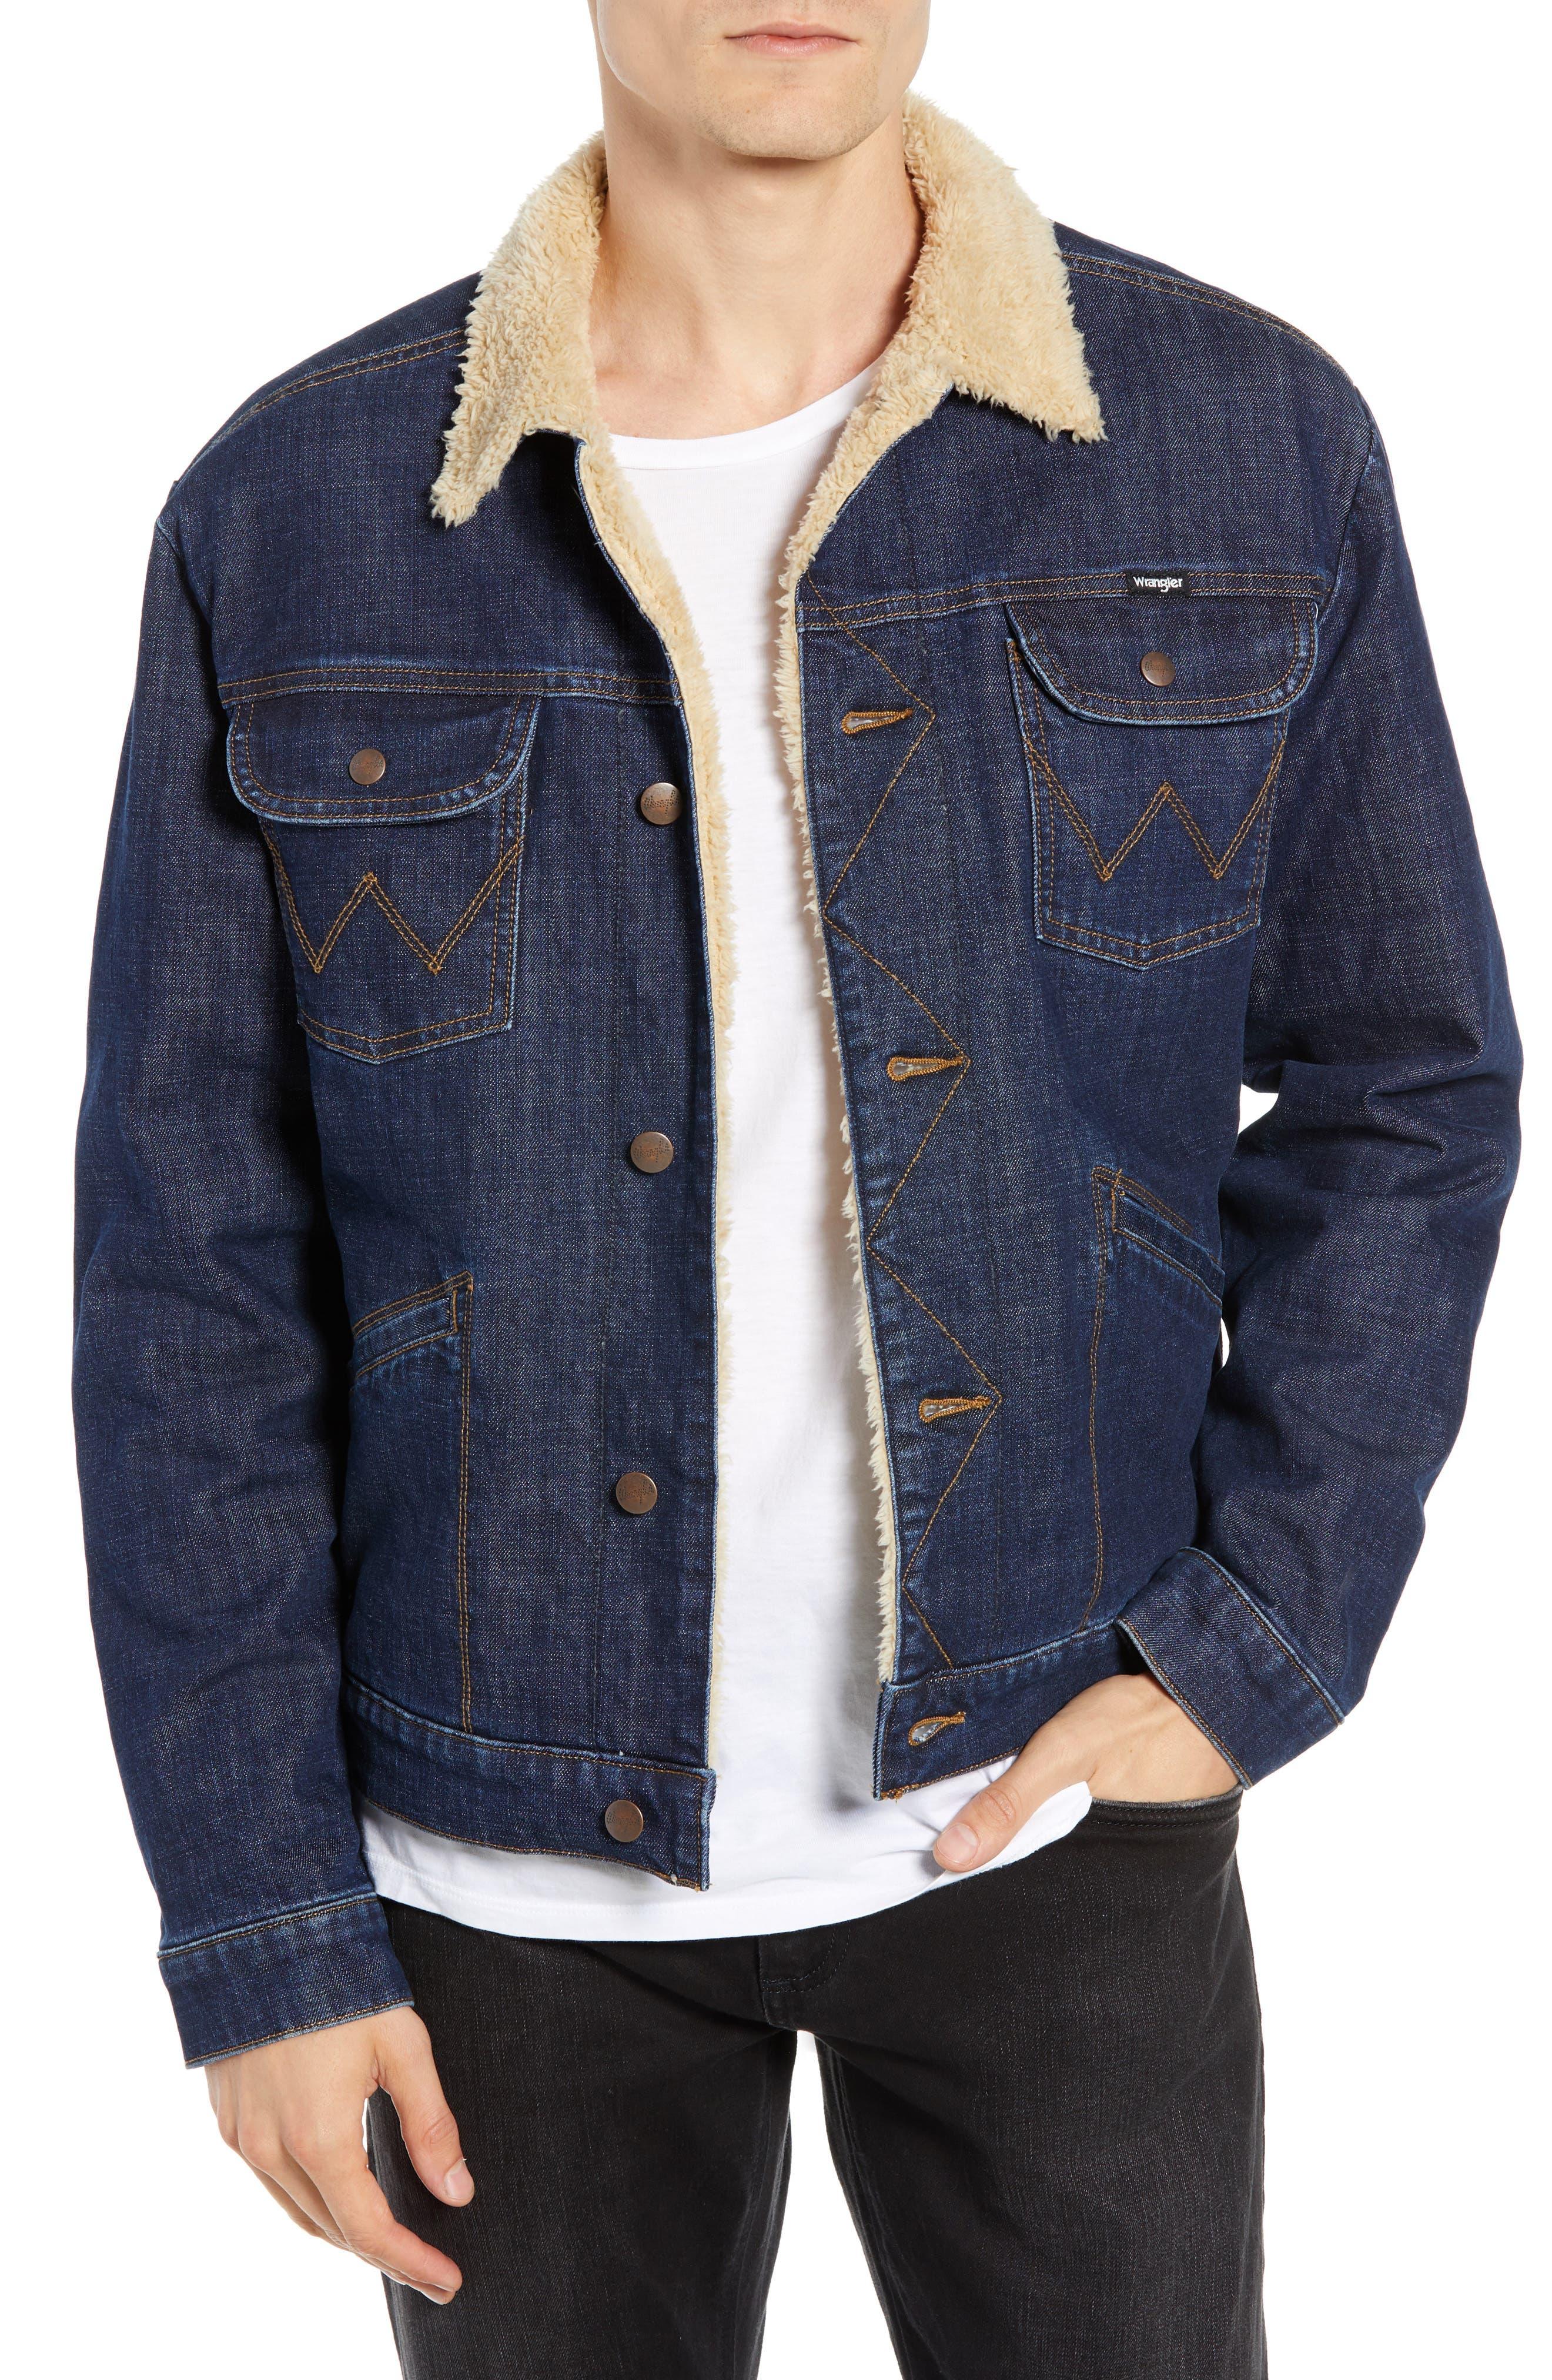 WRANGLER, Heritage Fleece Lined Denim Jacket, Main thumbnail 1, color, 472